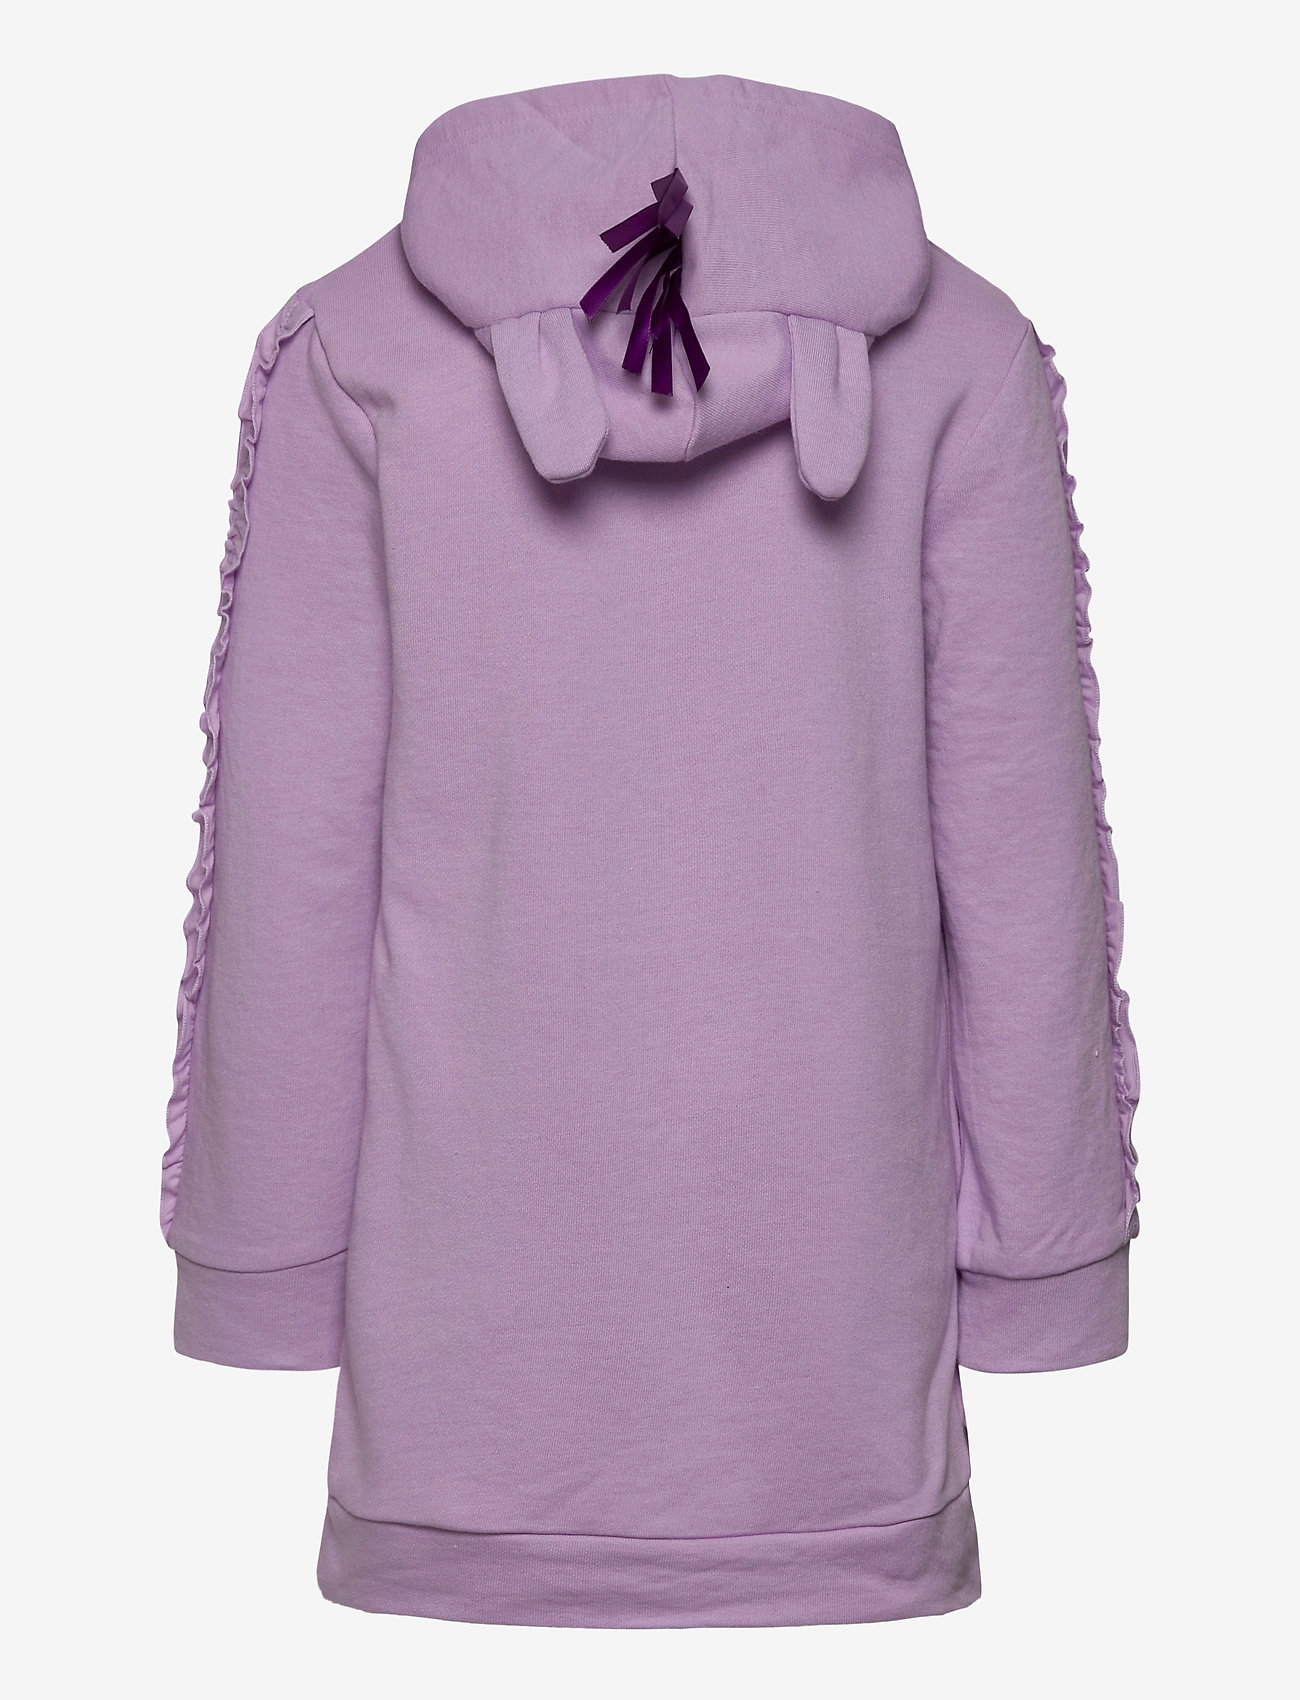 My Little Pony - DRESS WITH LONG SLEEVES - hoodies - purple - 1